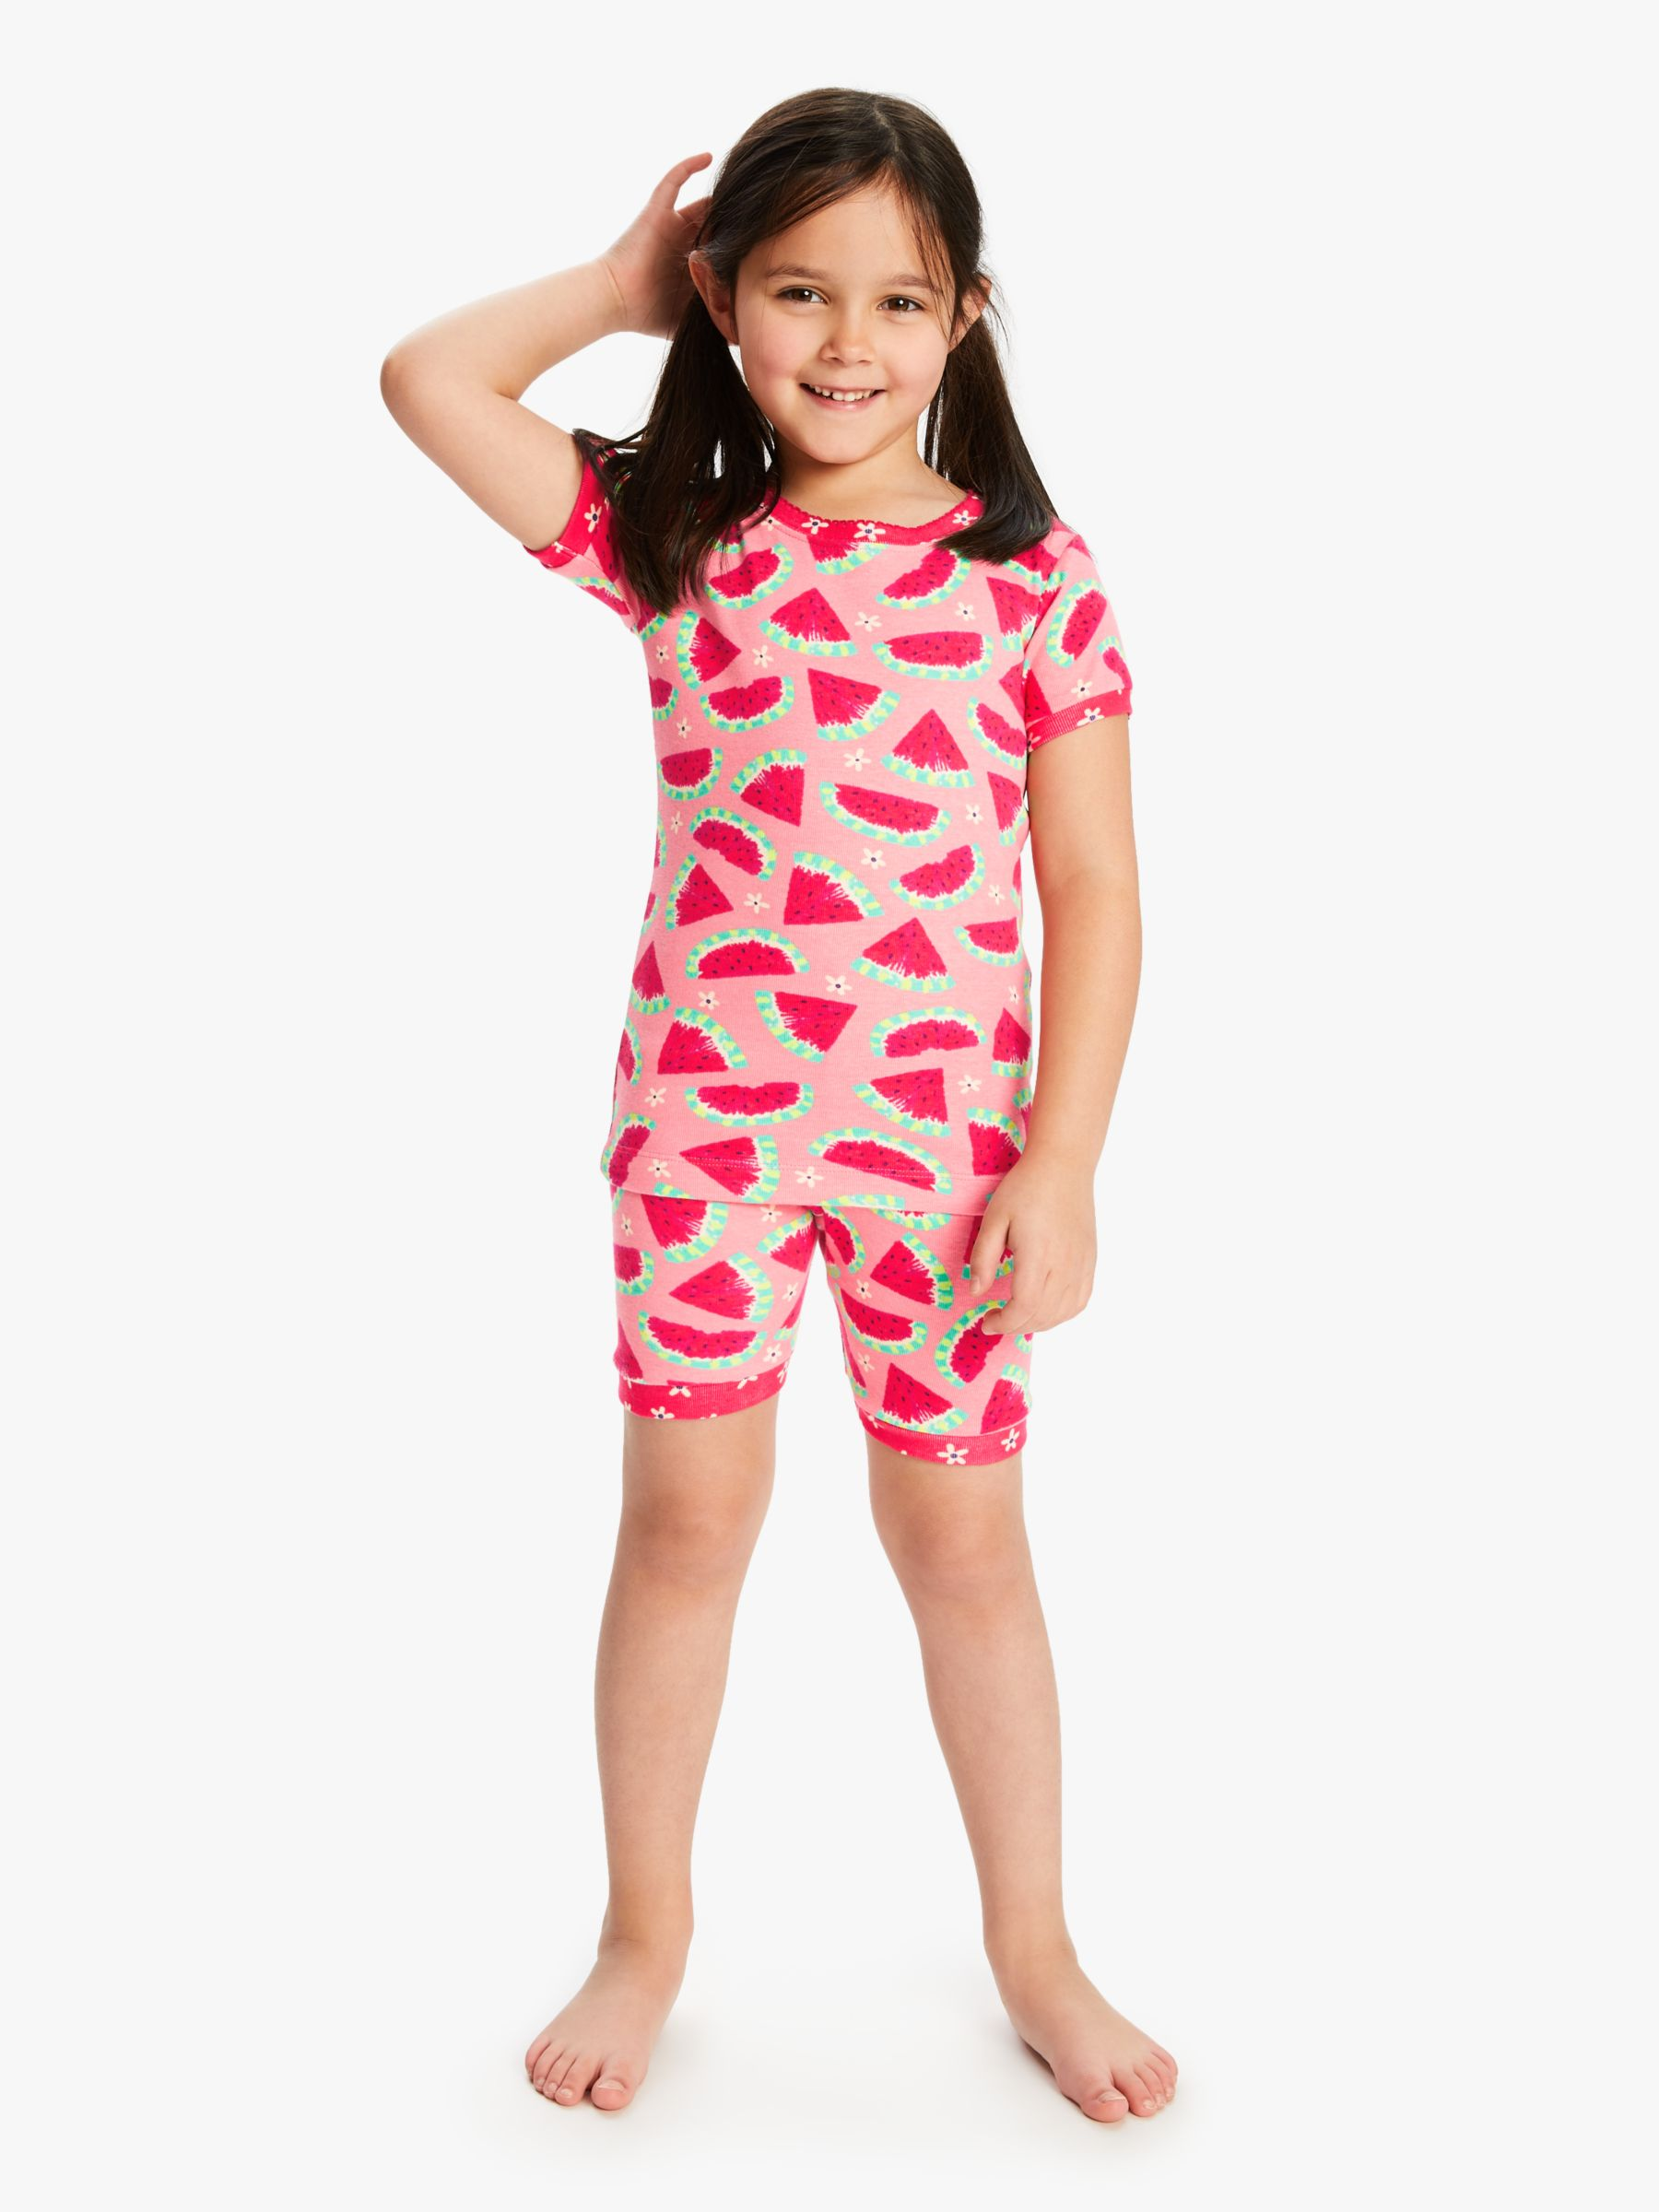 Hatley Hatley Girls' Watermelon Print Short Pyjamas, Pink